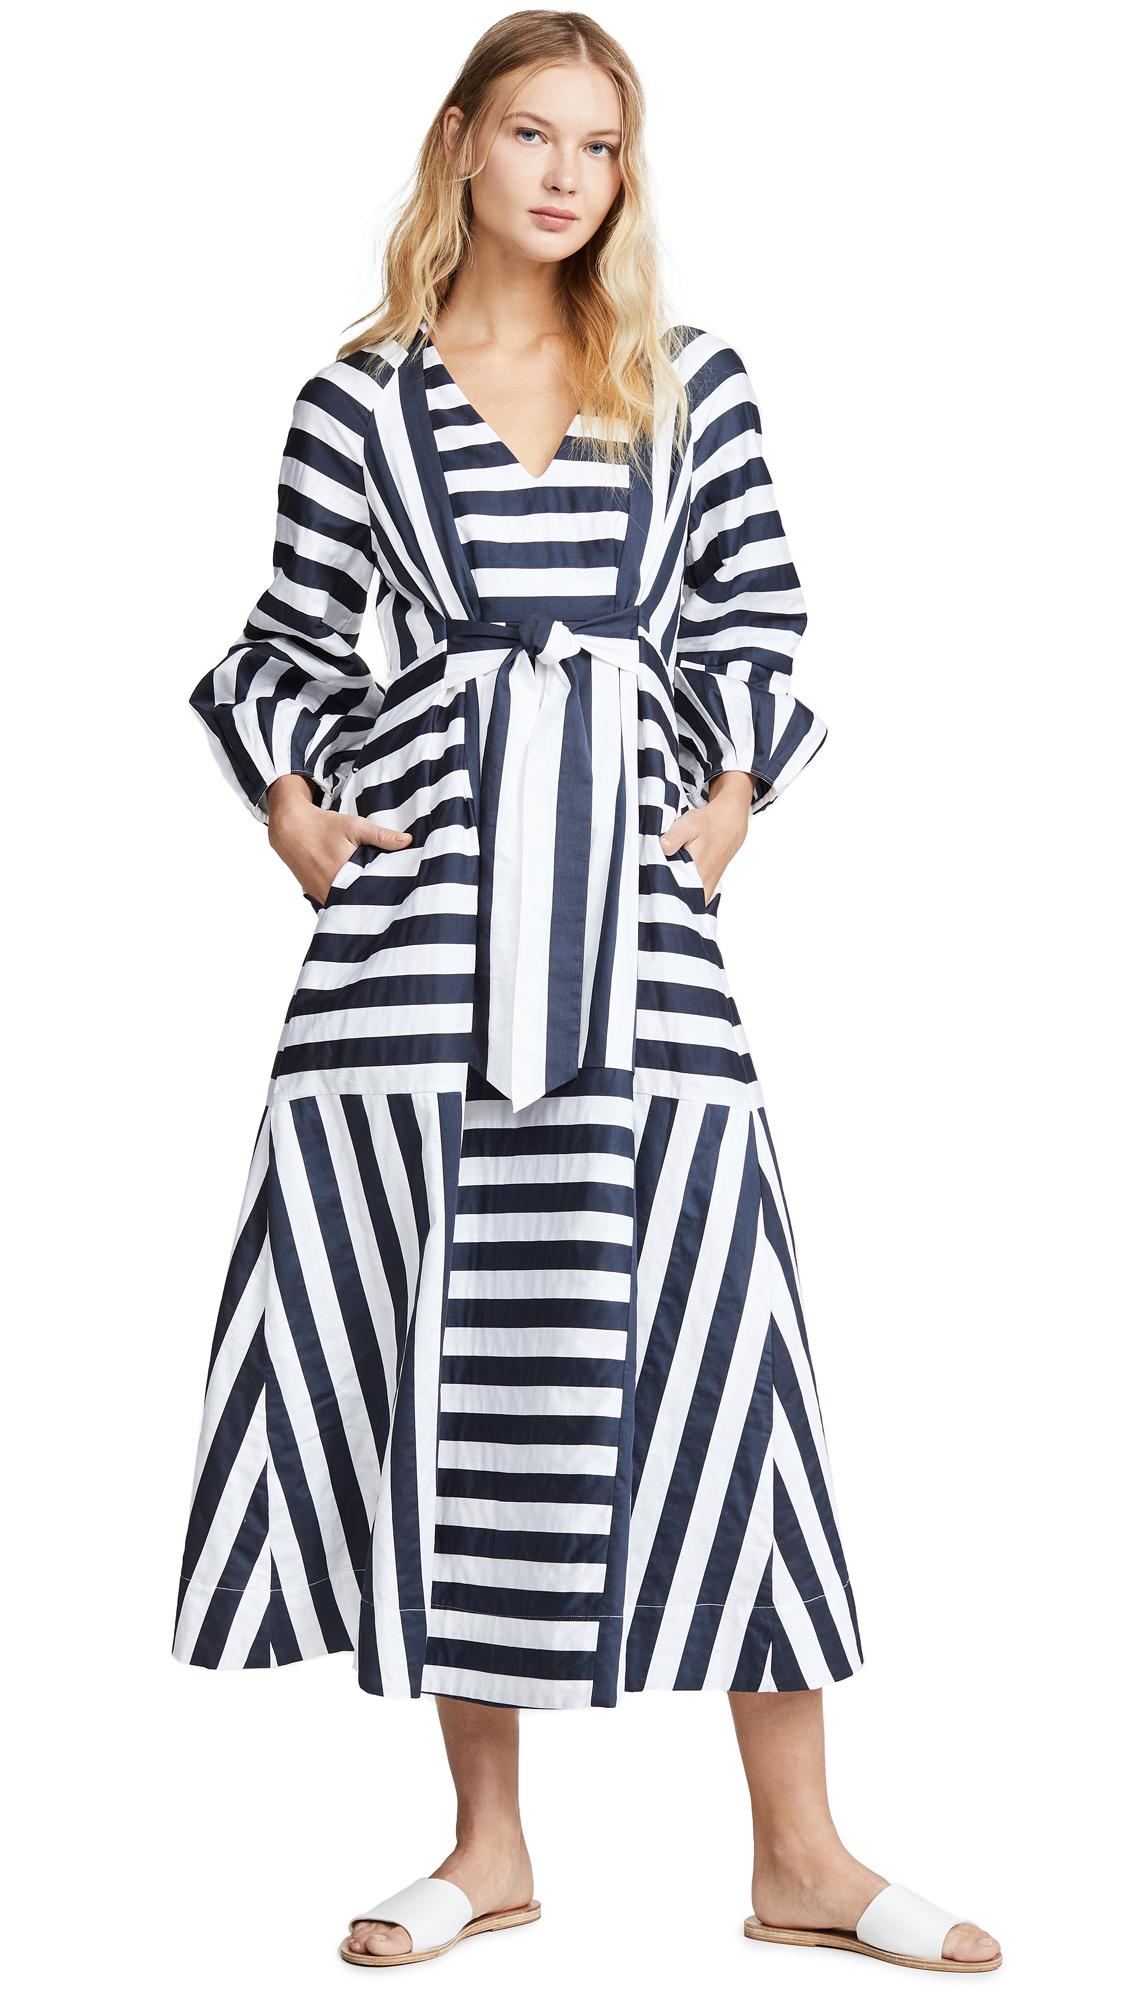 Mara Hoffman Vivica Dress - Navy/White